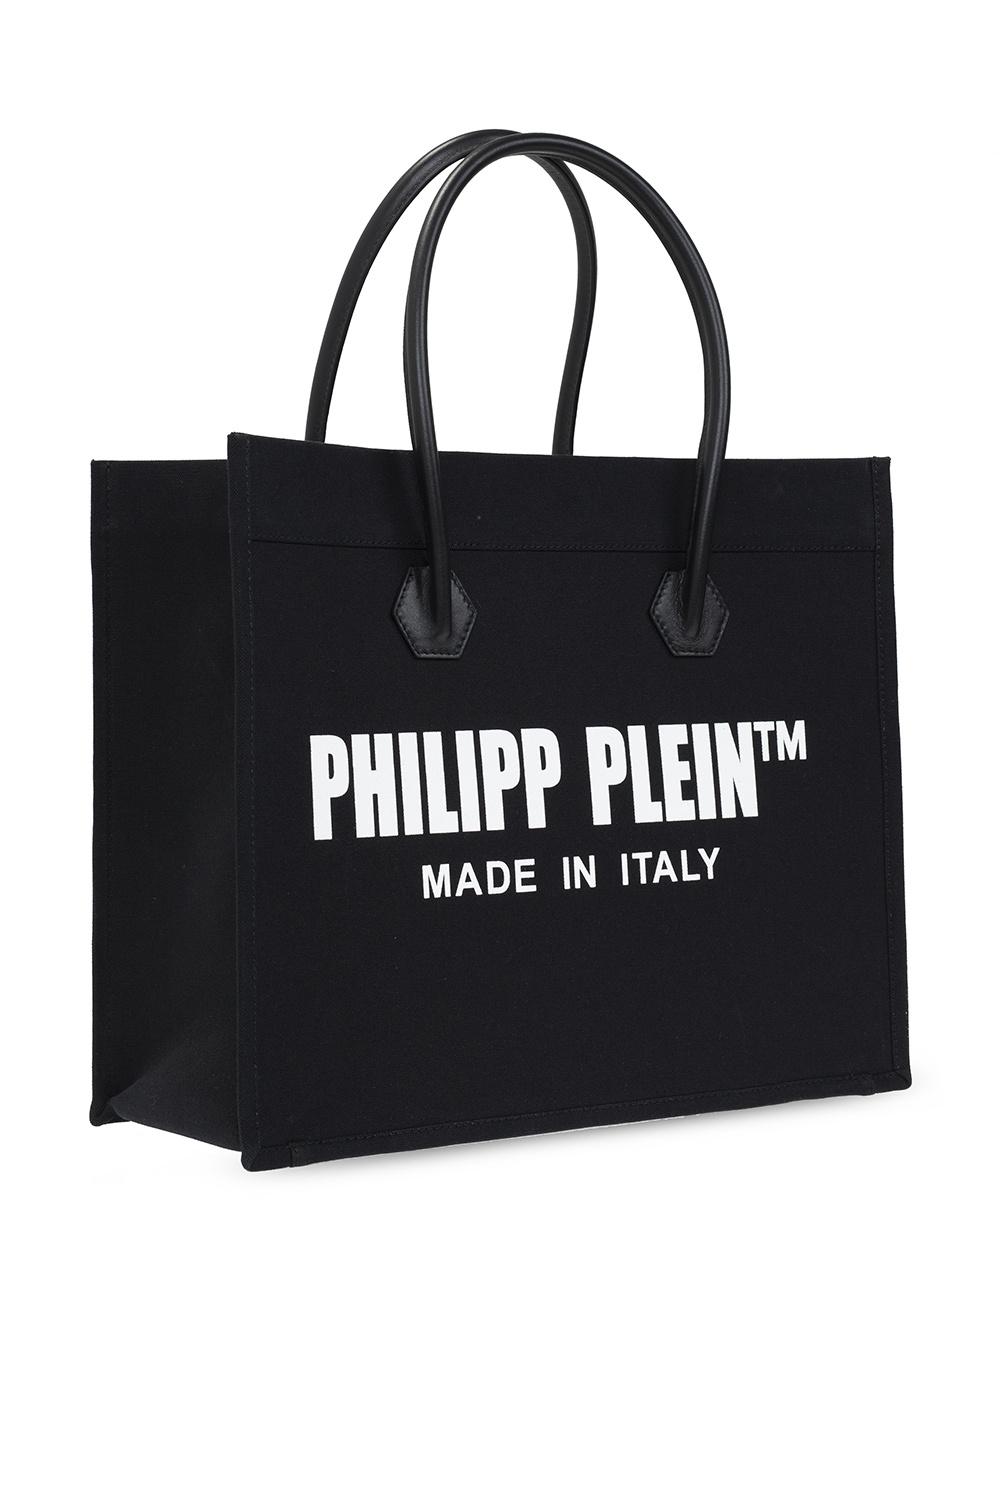 Philipp Plein Torba typu 'shopper'